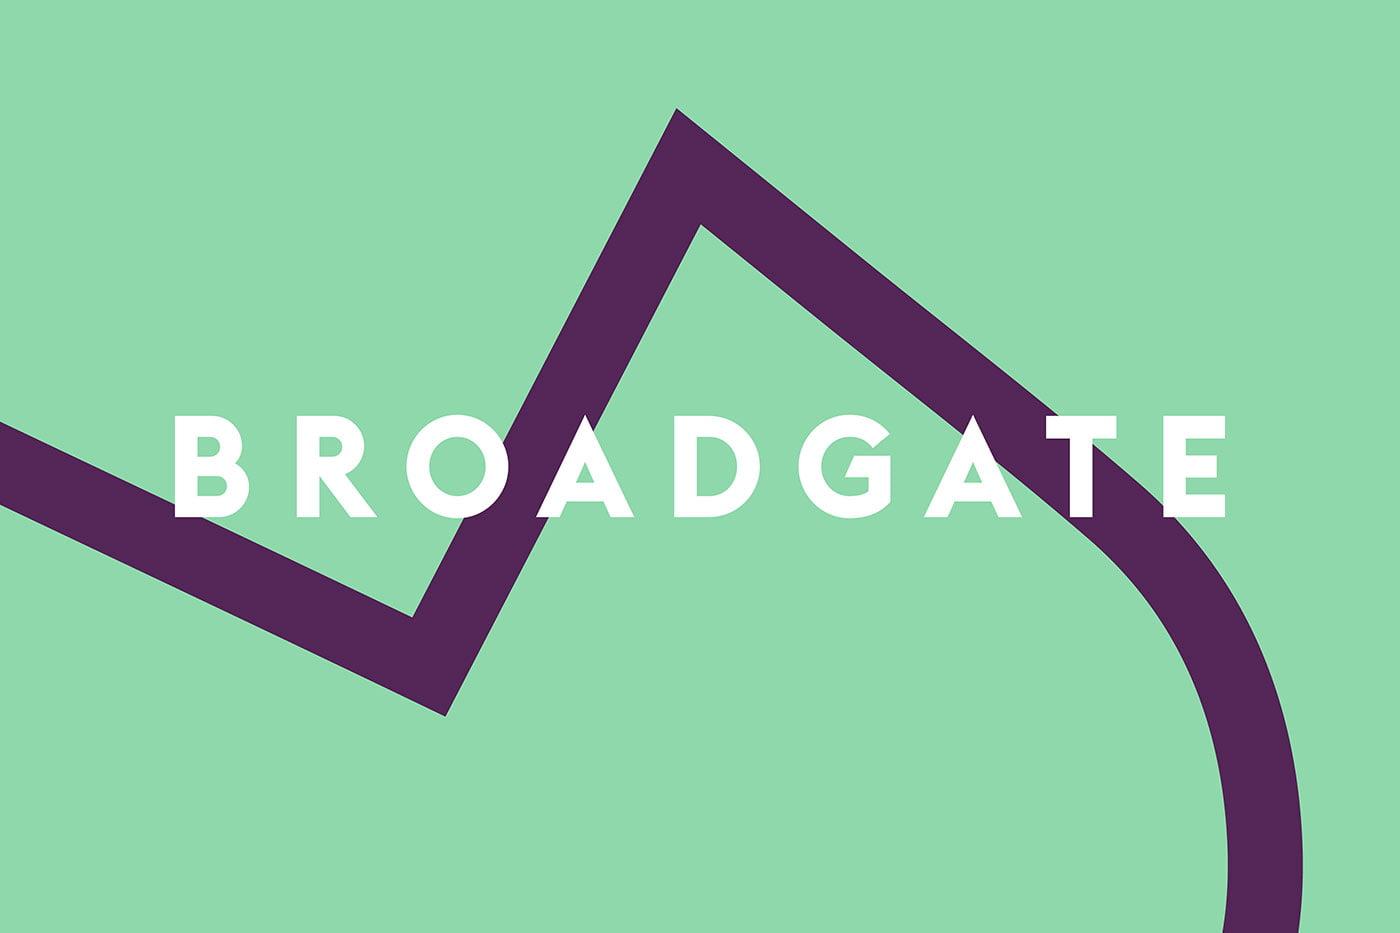 broadgate-identity-04